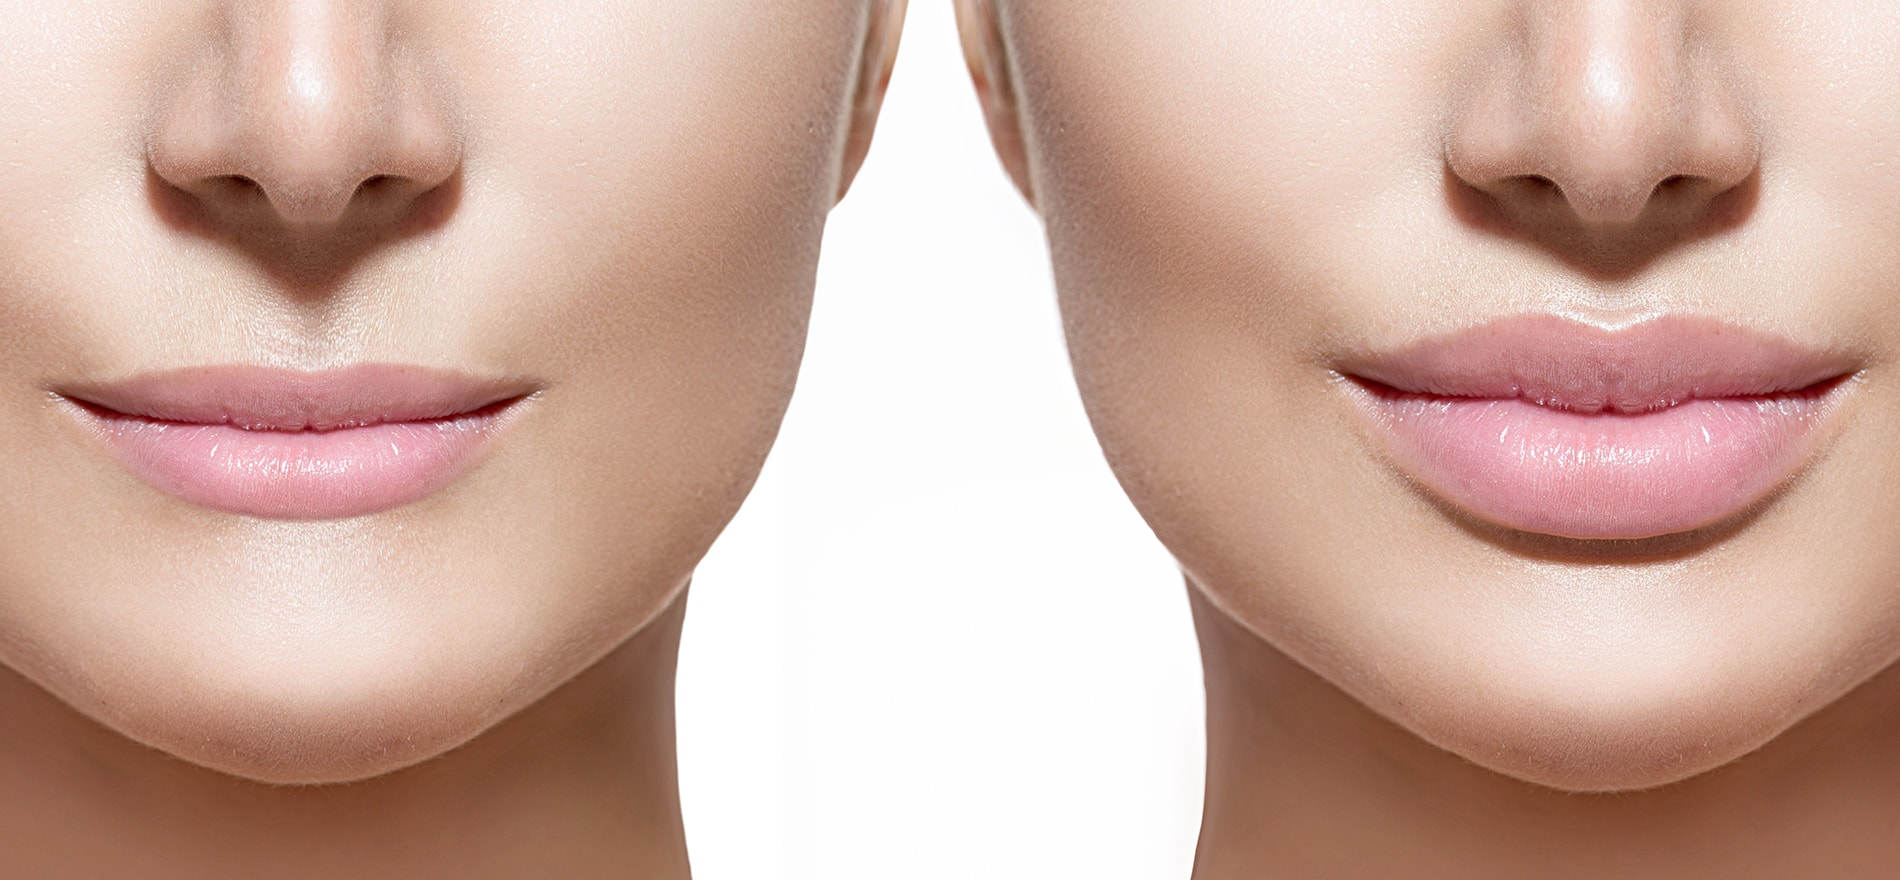 Lippen-aufspritzen-Lippenunterspritzung-Hyaluronsäure